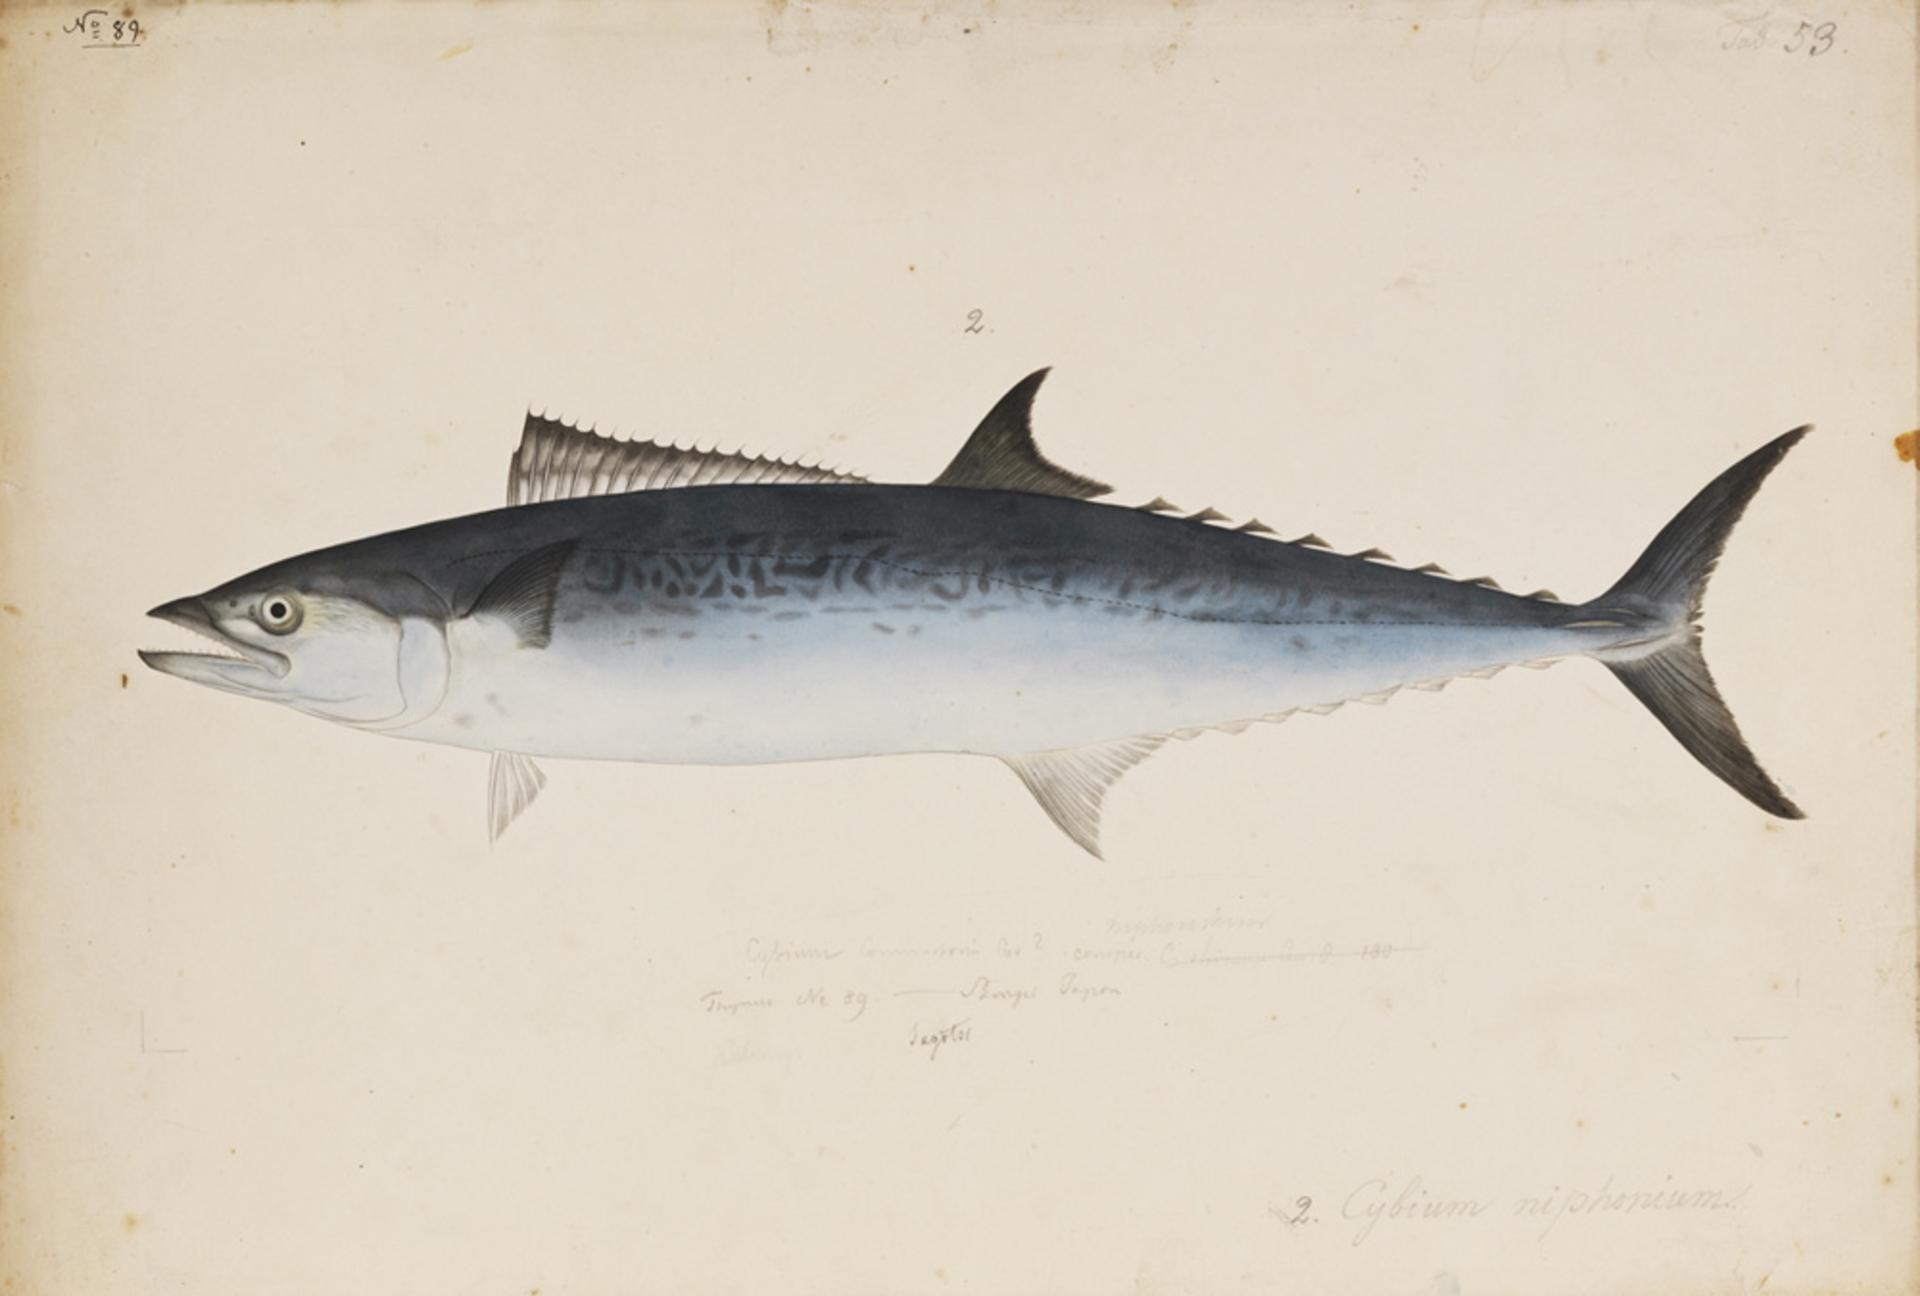 RMNH.ART.192 | Scomberomorus nichonius